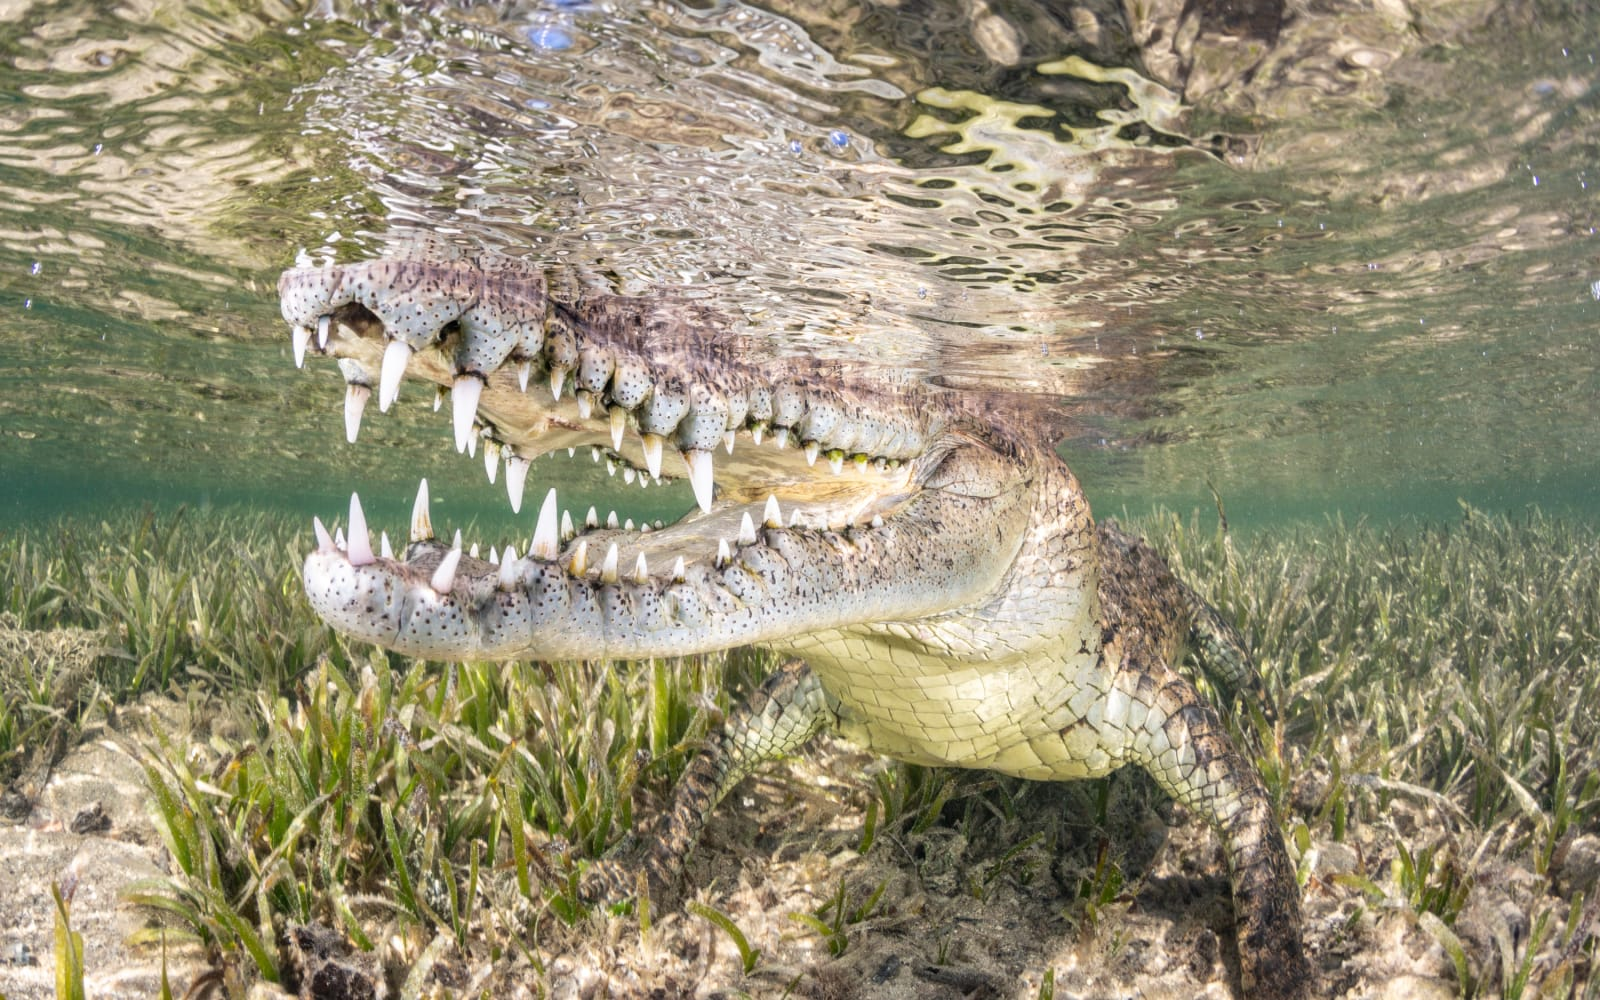 >American Crocodile